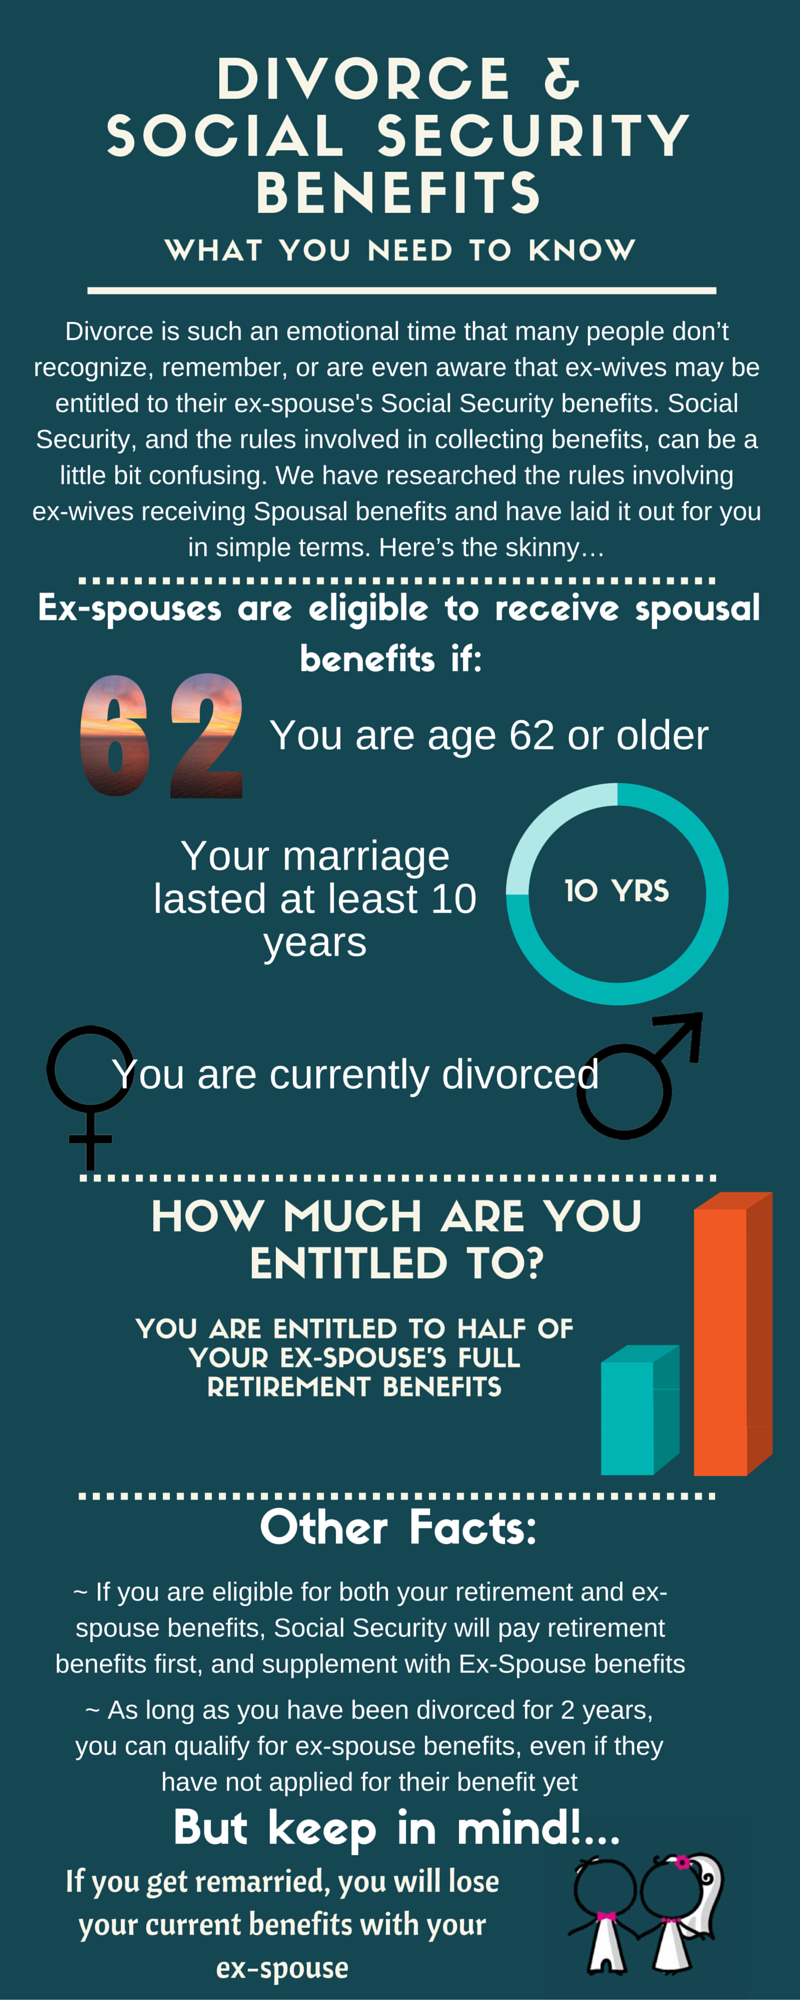 Divorce-Social-Security-Benefits